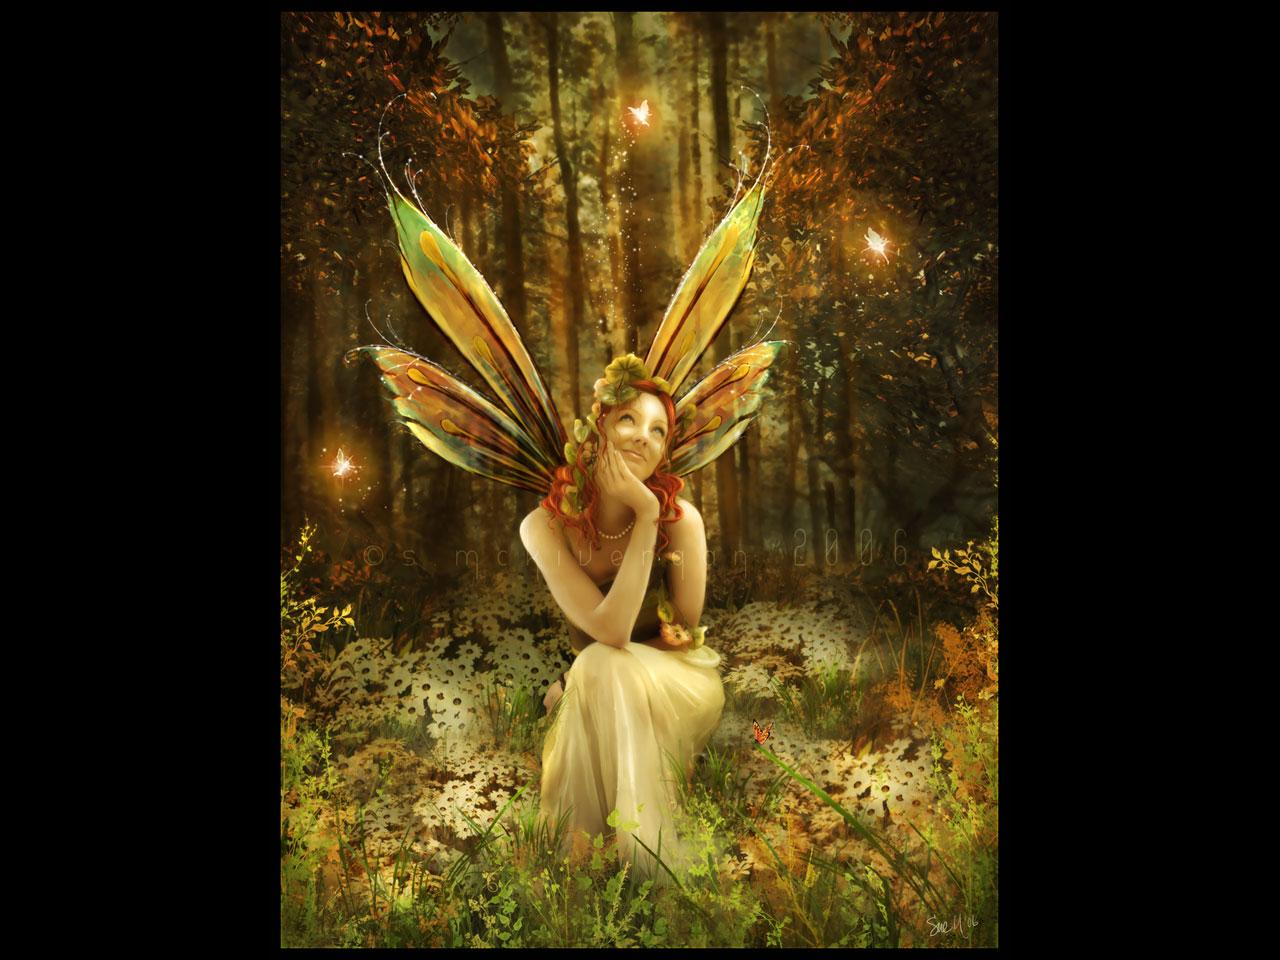 Fairies screensavers and wallpapers wallpapersafari - Free fairy wallpaper and screensavers ...